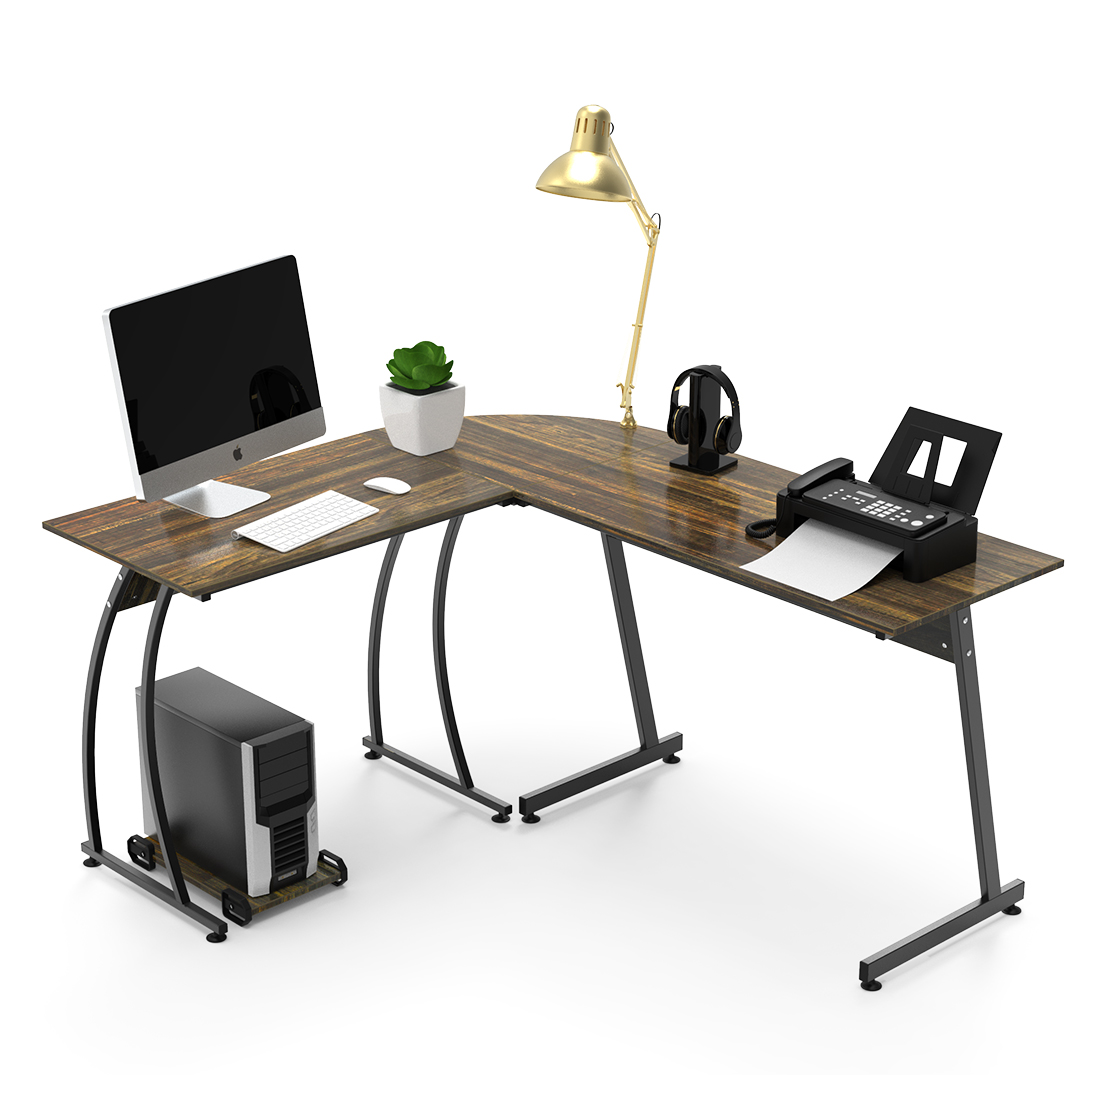 Details about l shaped corner computer desk 59 x 51 home office desks 3 piece corner table